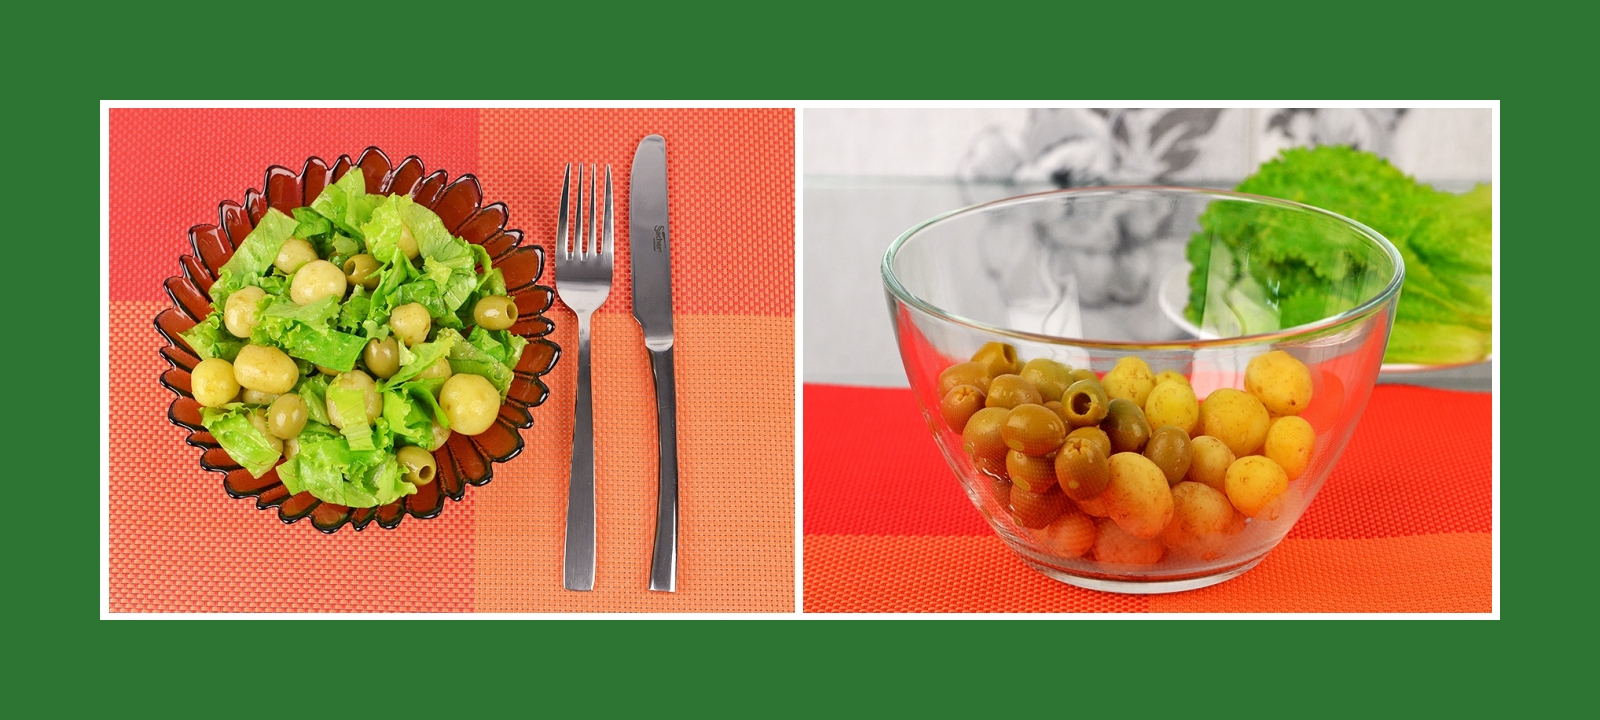 Kartoffelsalat mit grünen Oliven